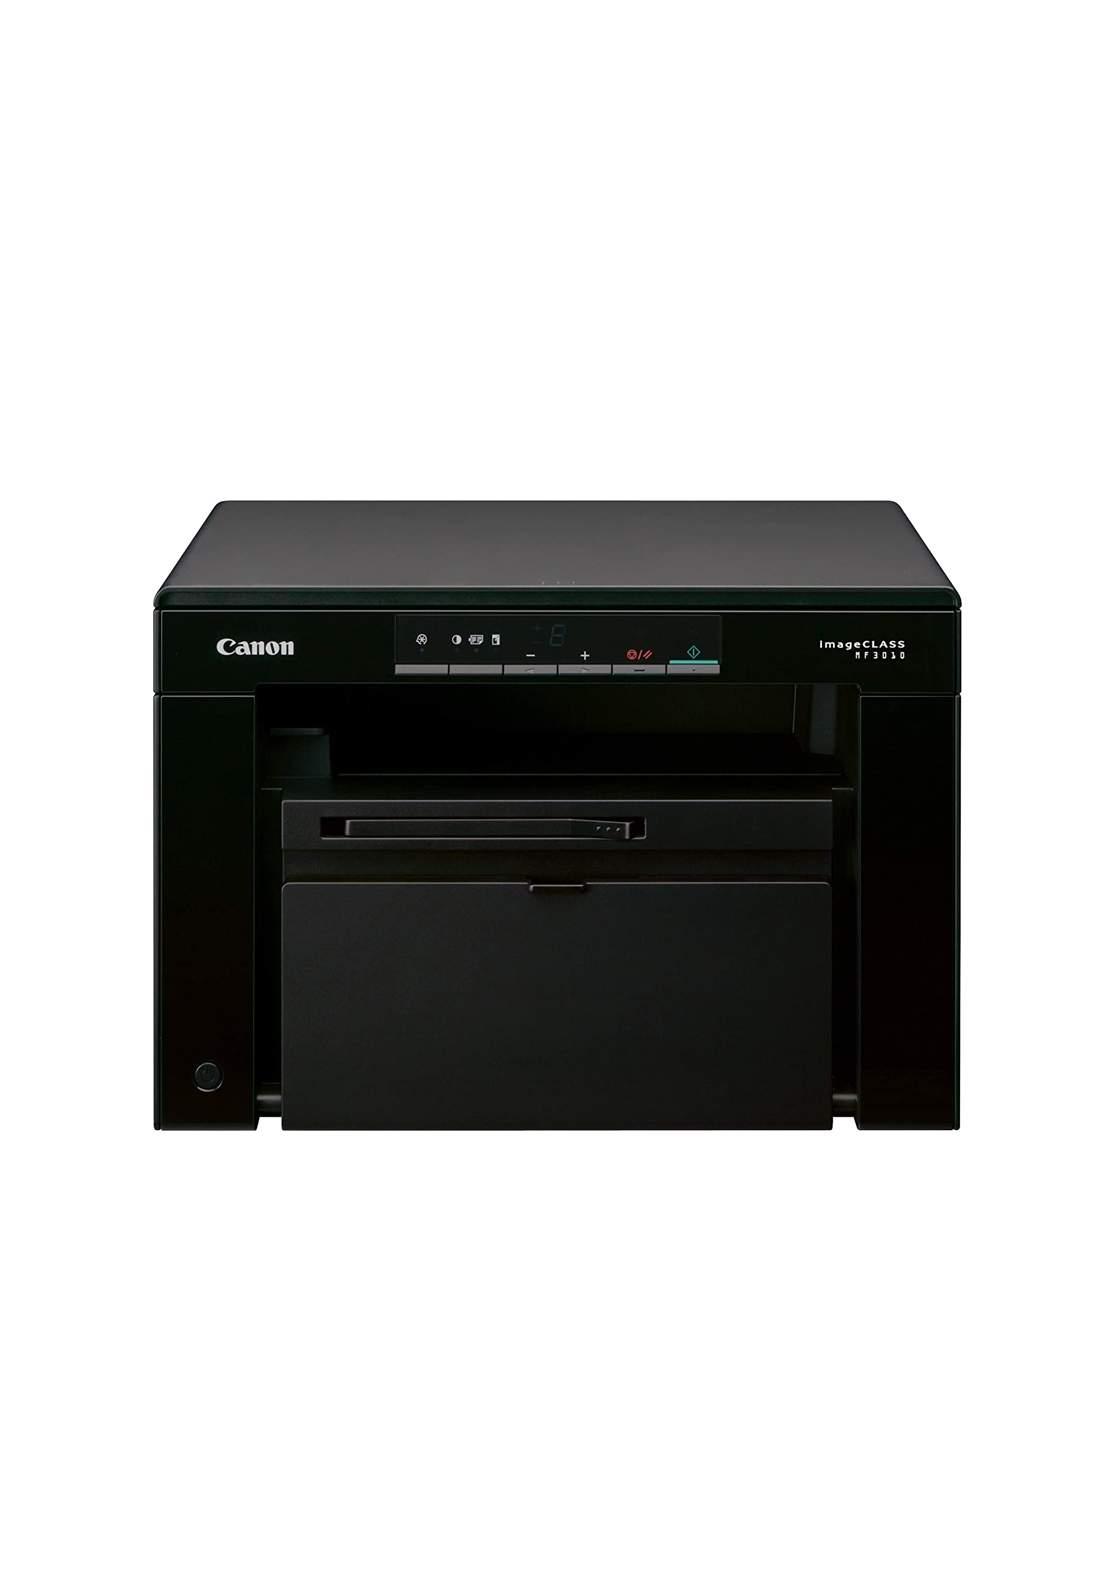 Canon i-SENSYS MF3010 Multifunction Laser Printer - Black طابعة